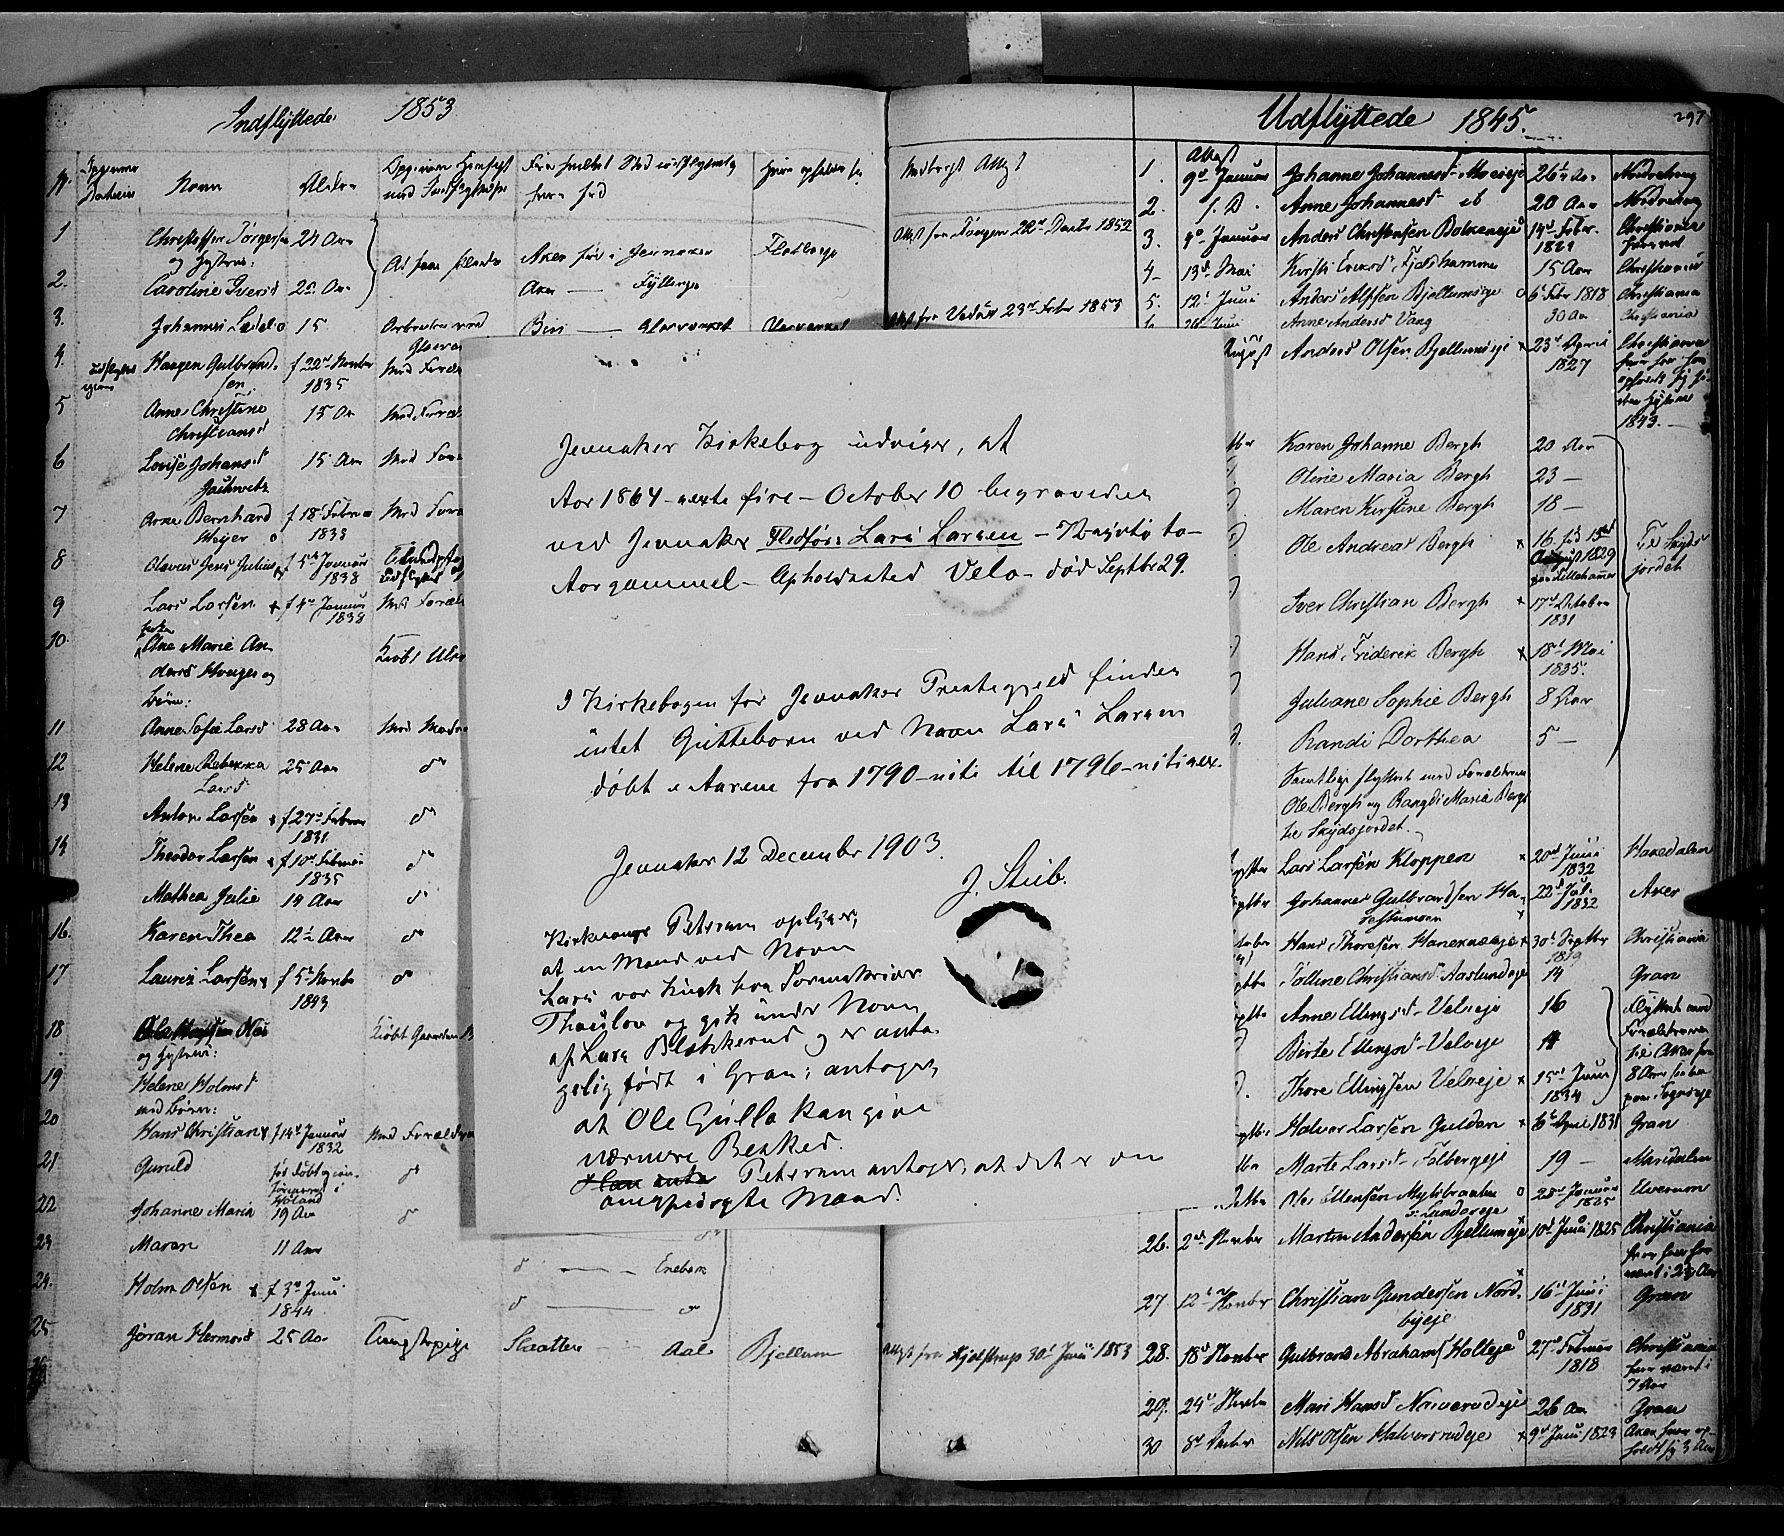 SAH, Jevnaker prestekontor, Ministerialbok nr. 6, 1837-1857, s. 297